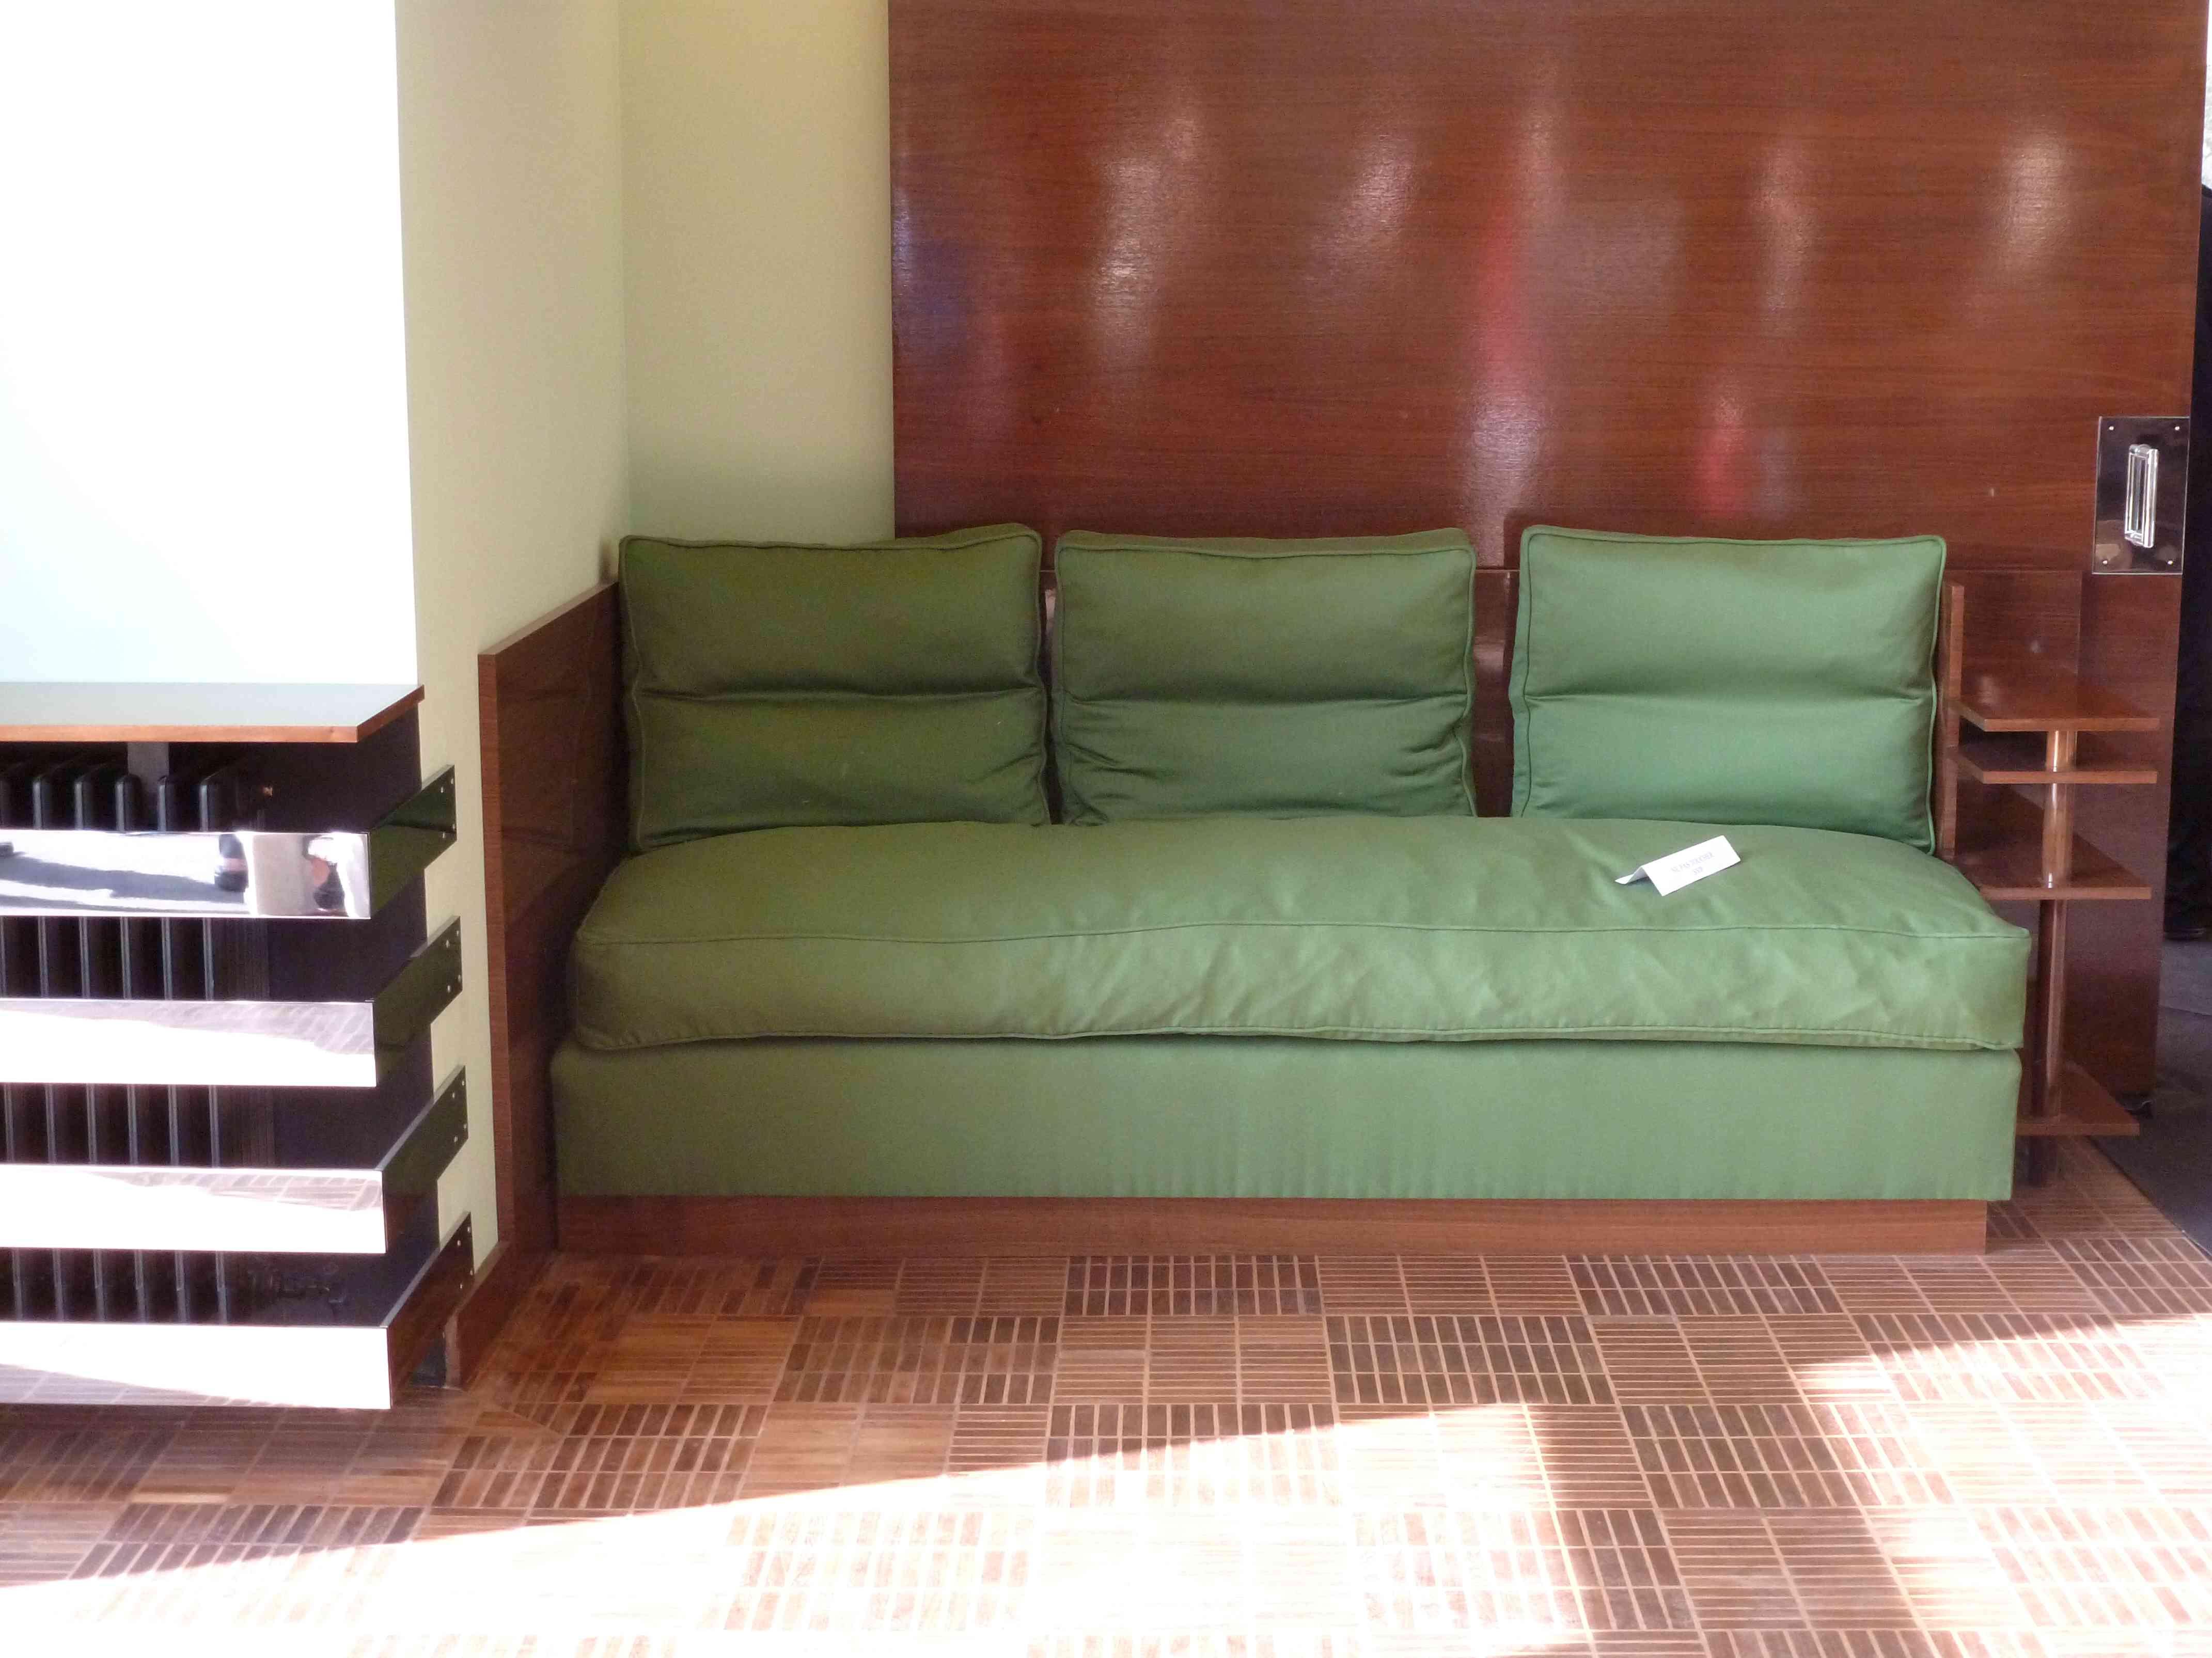 Villa Cavrois Croix 09-2013 salon vert